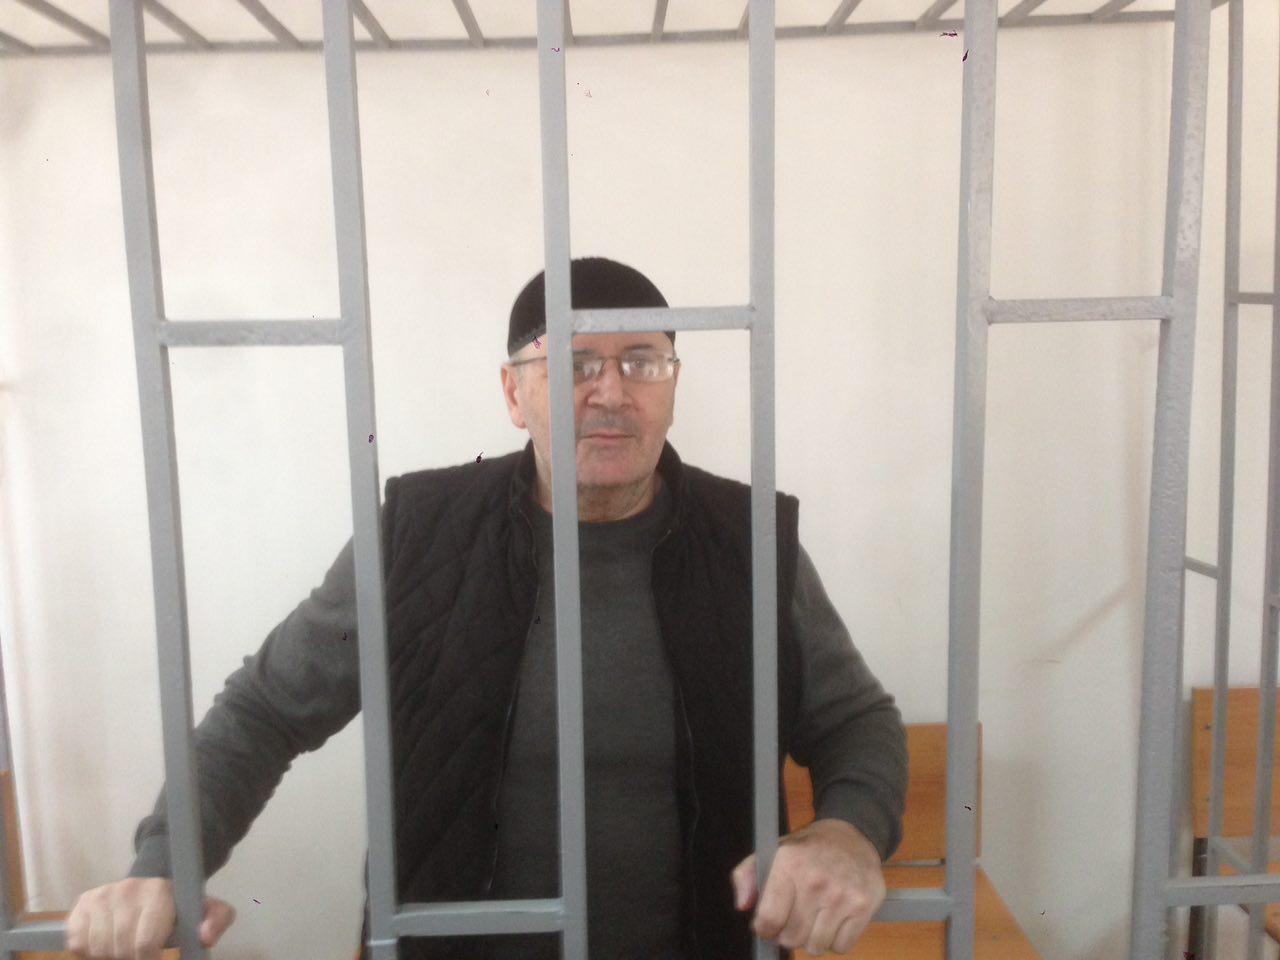 фото ЗакС политика Амосов: Я считаю дело Титиева политическим